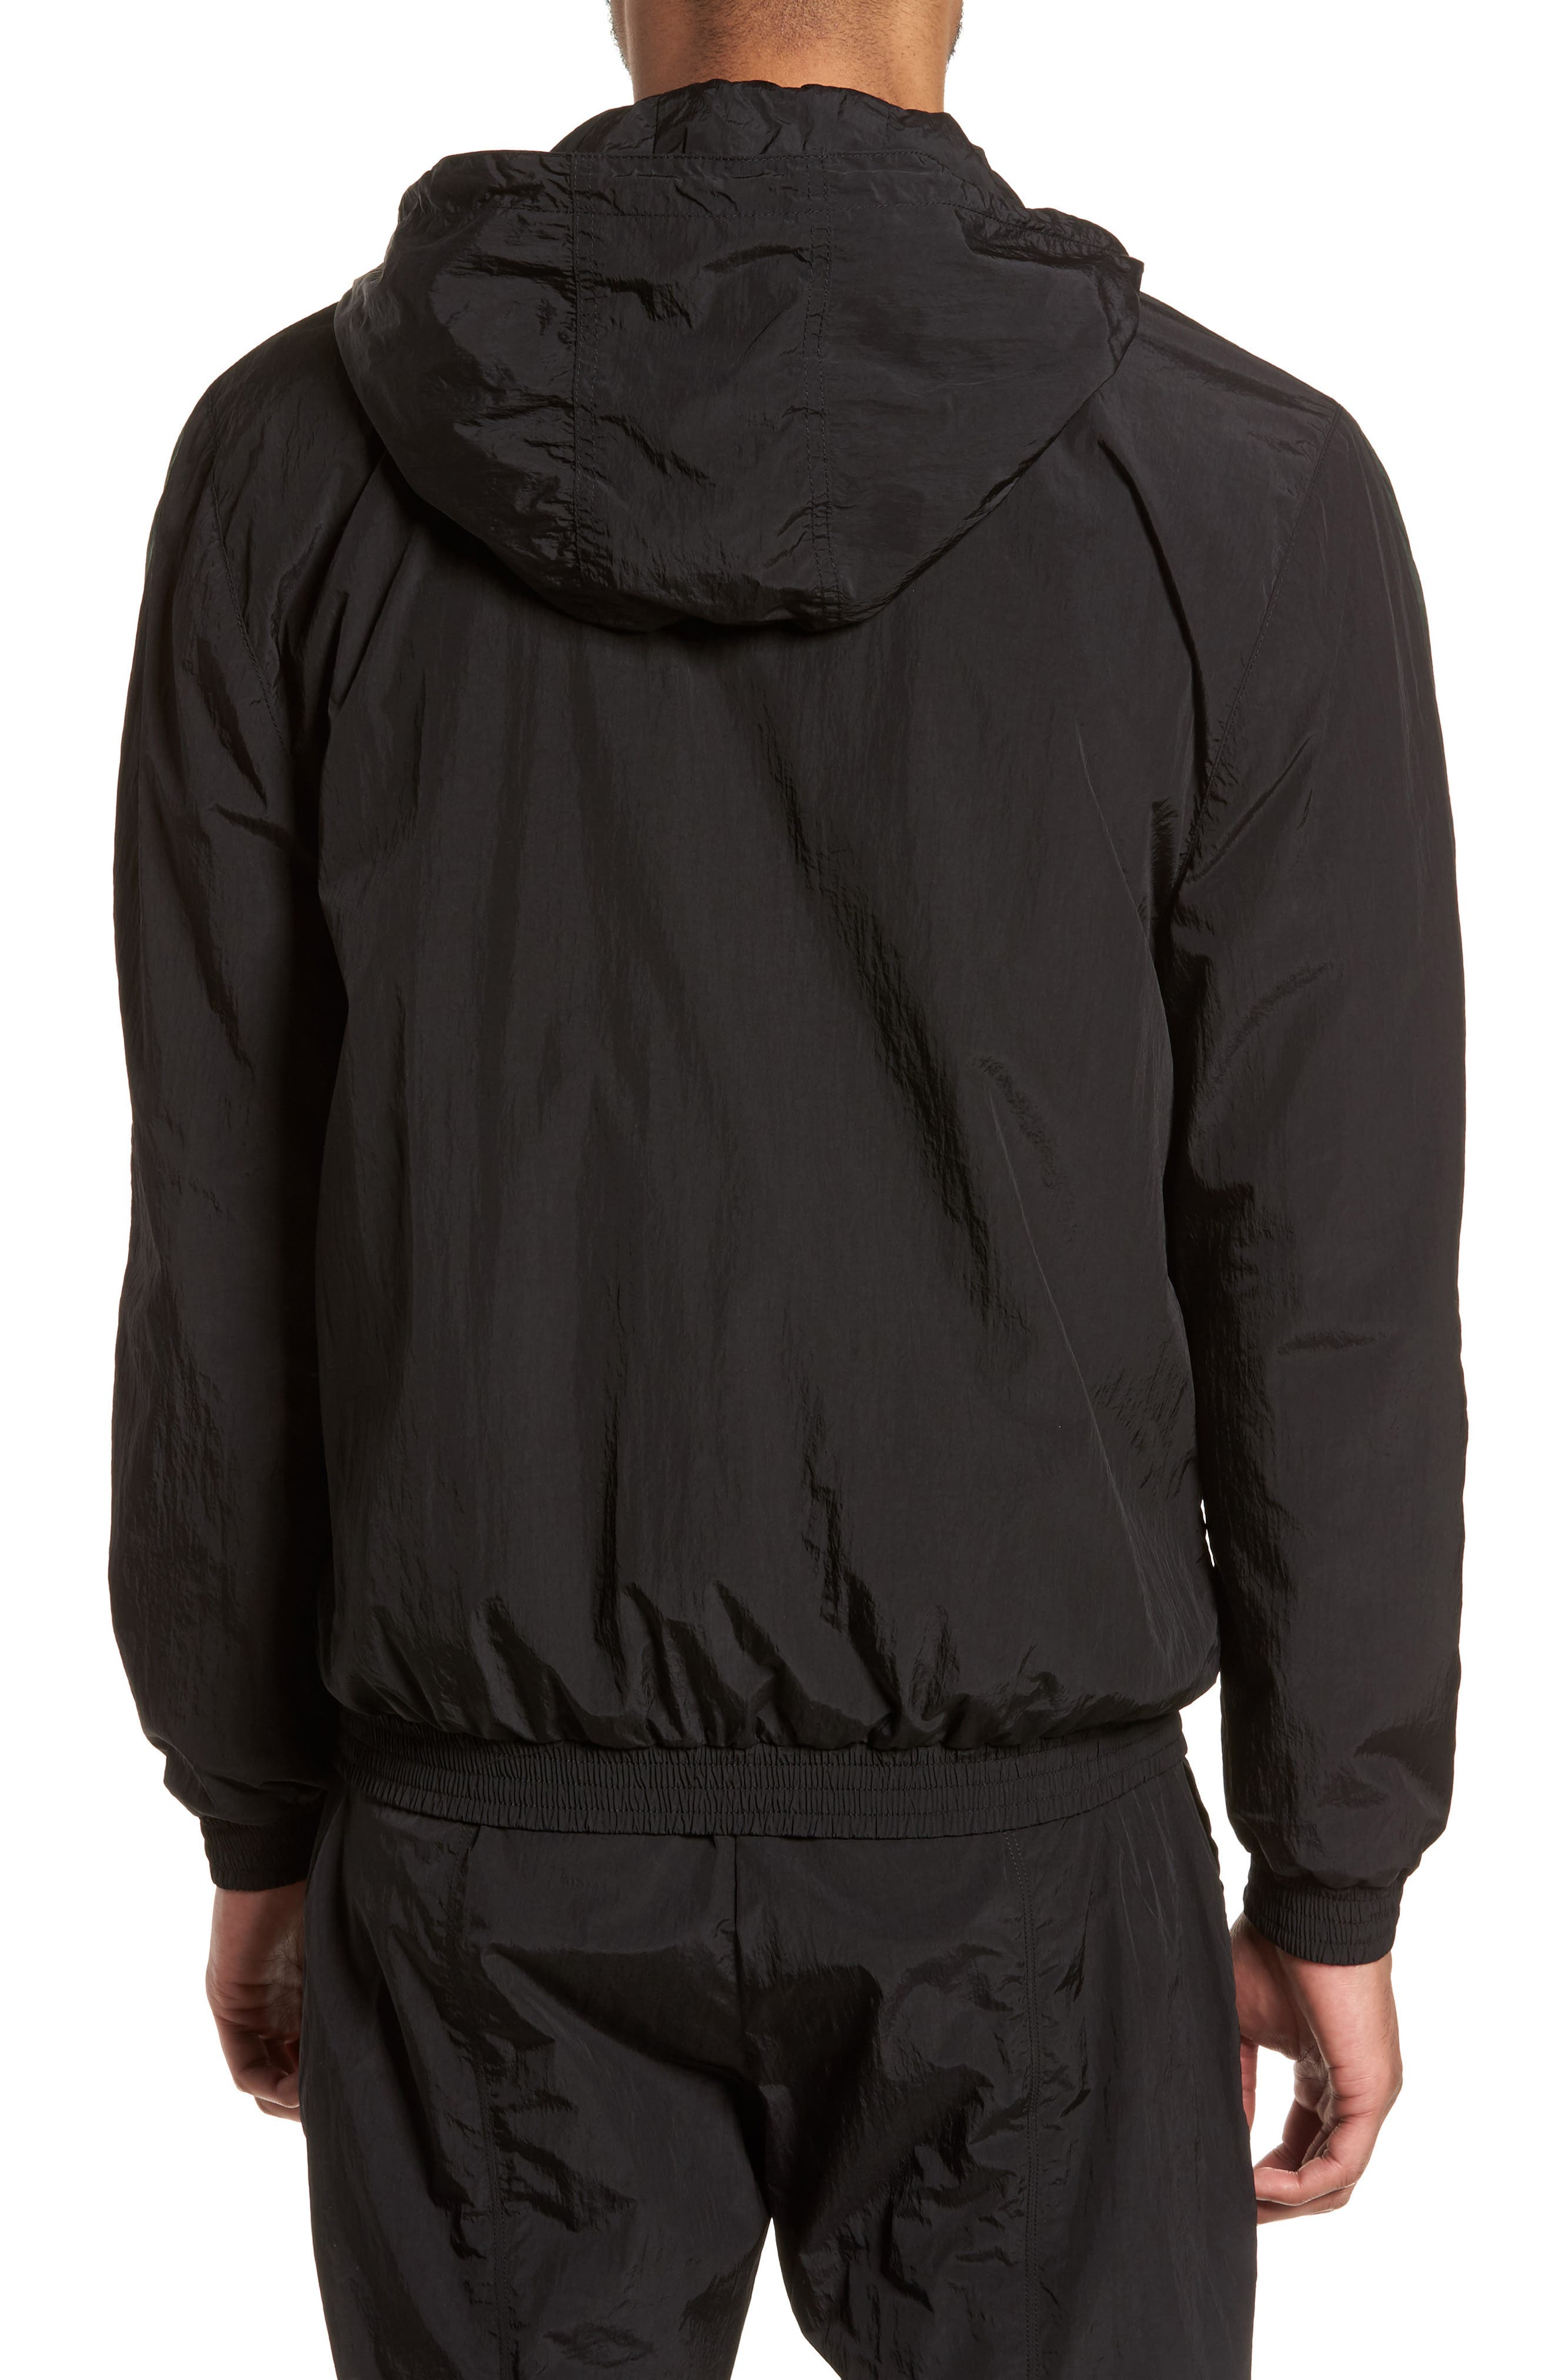 Hooded Shell Jacket,                             Alternate thumbnail 2, color,                             Black/ Deep Forest